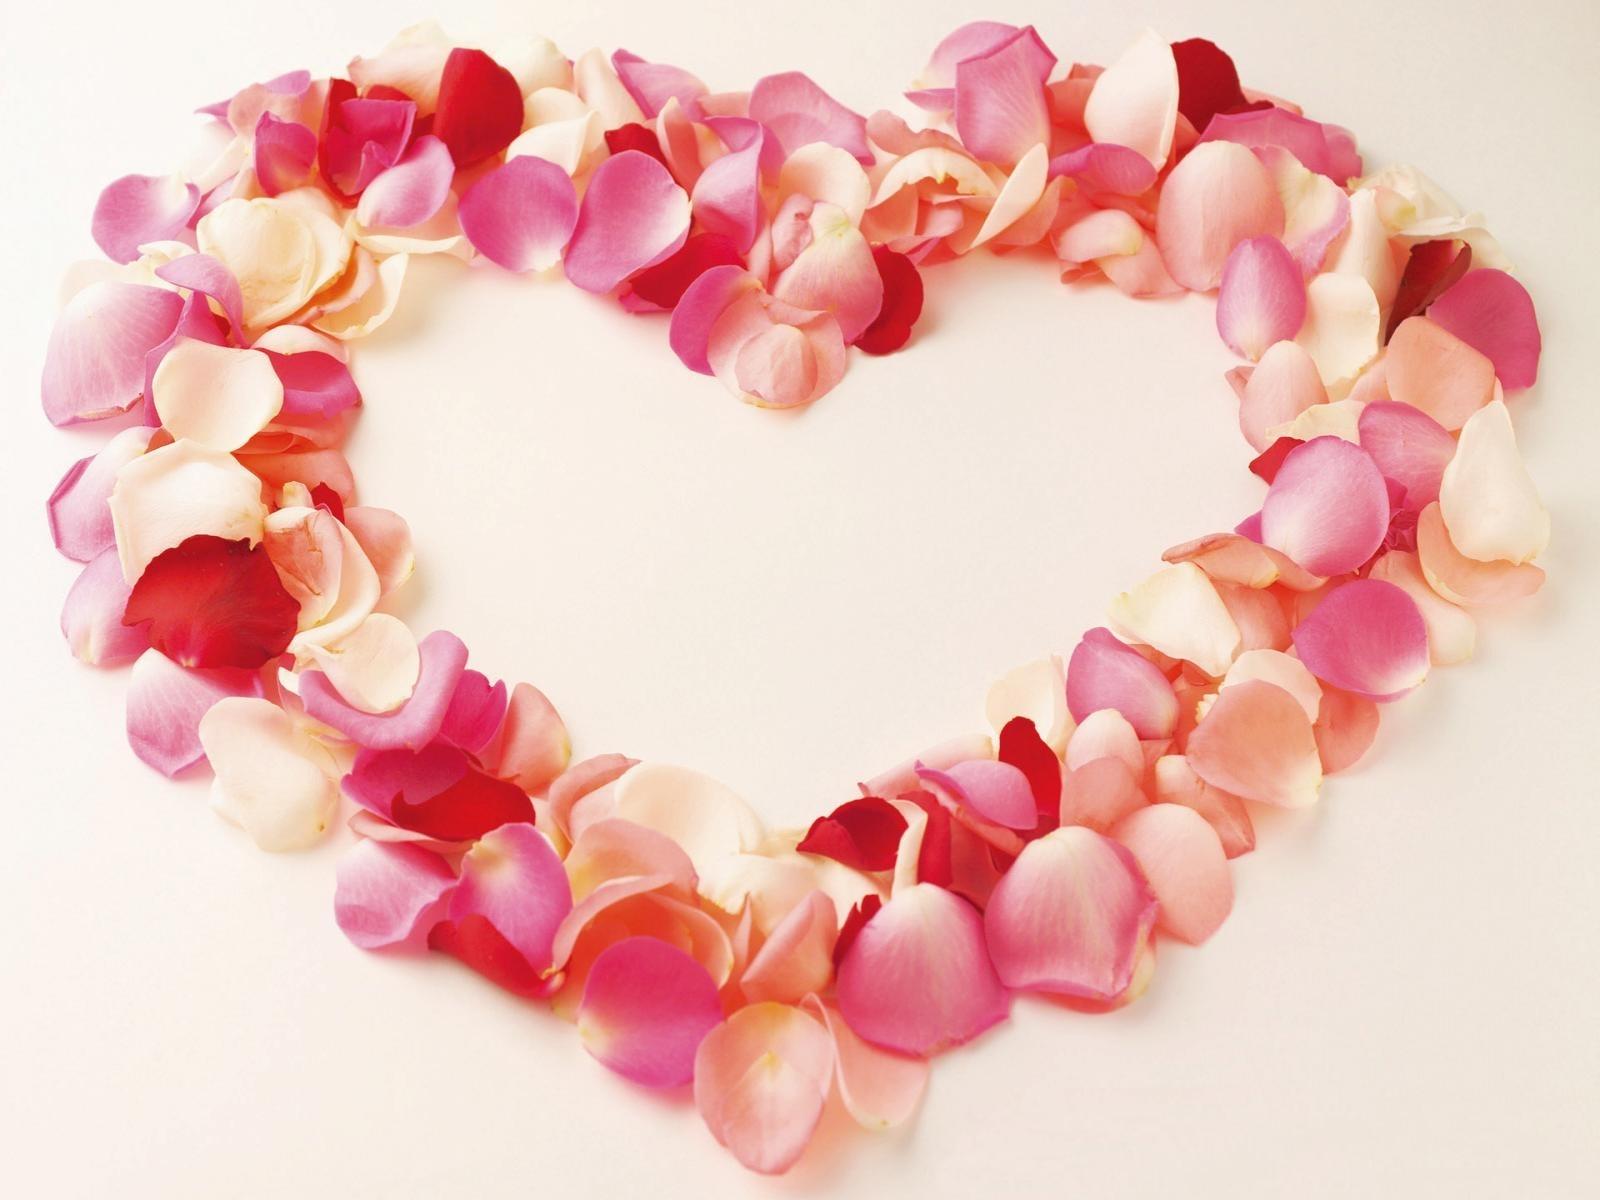 http://4.bp.blogspot.com/-GyntHXtCnSw/T8pIROhpXCI/AAAAAAAAA4w/DyccZDEKD28/s1600/love+wallpapers+(4).JPG